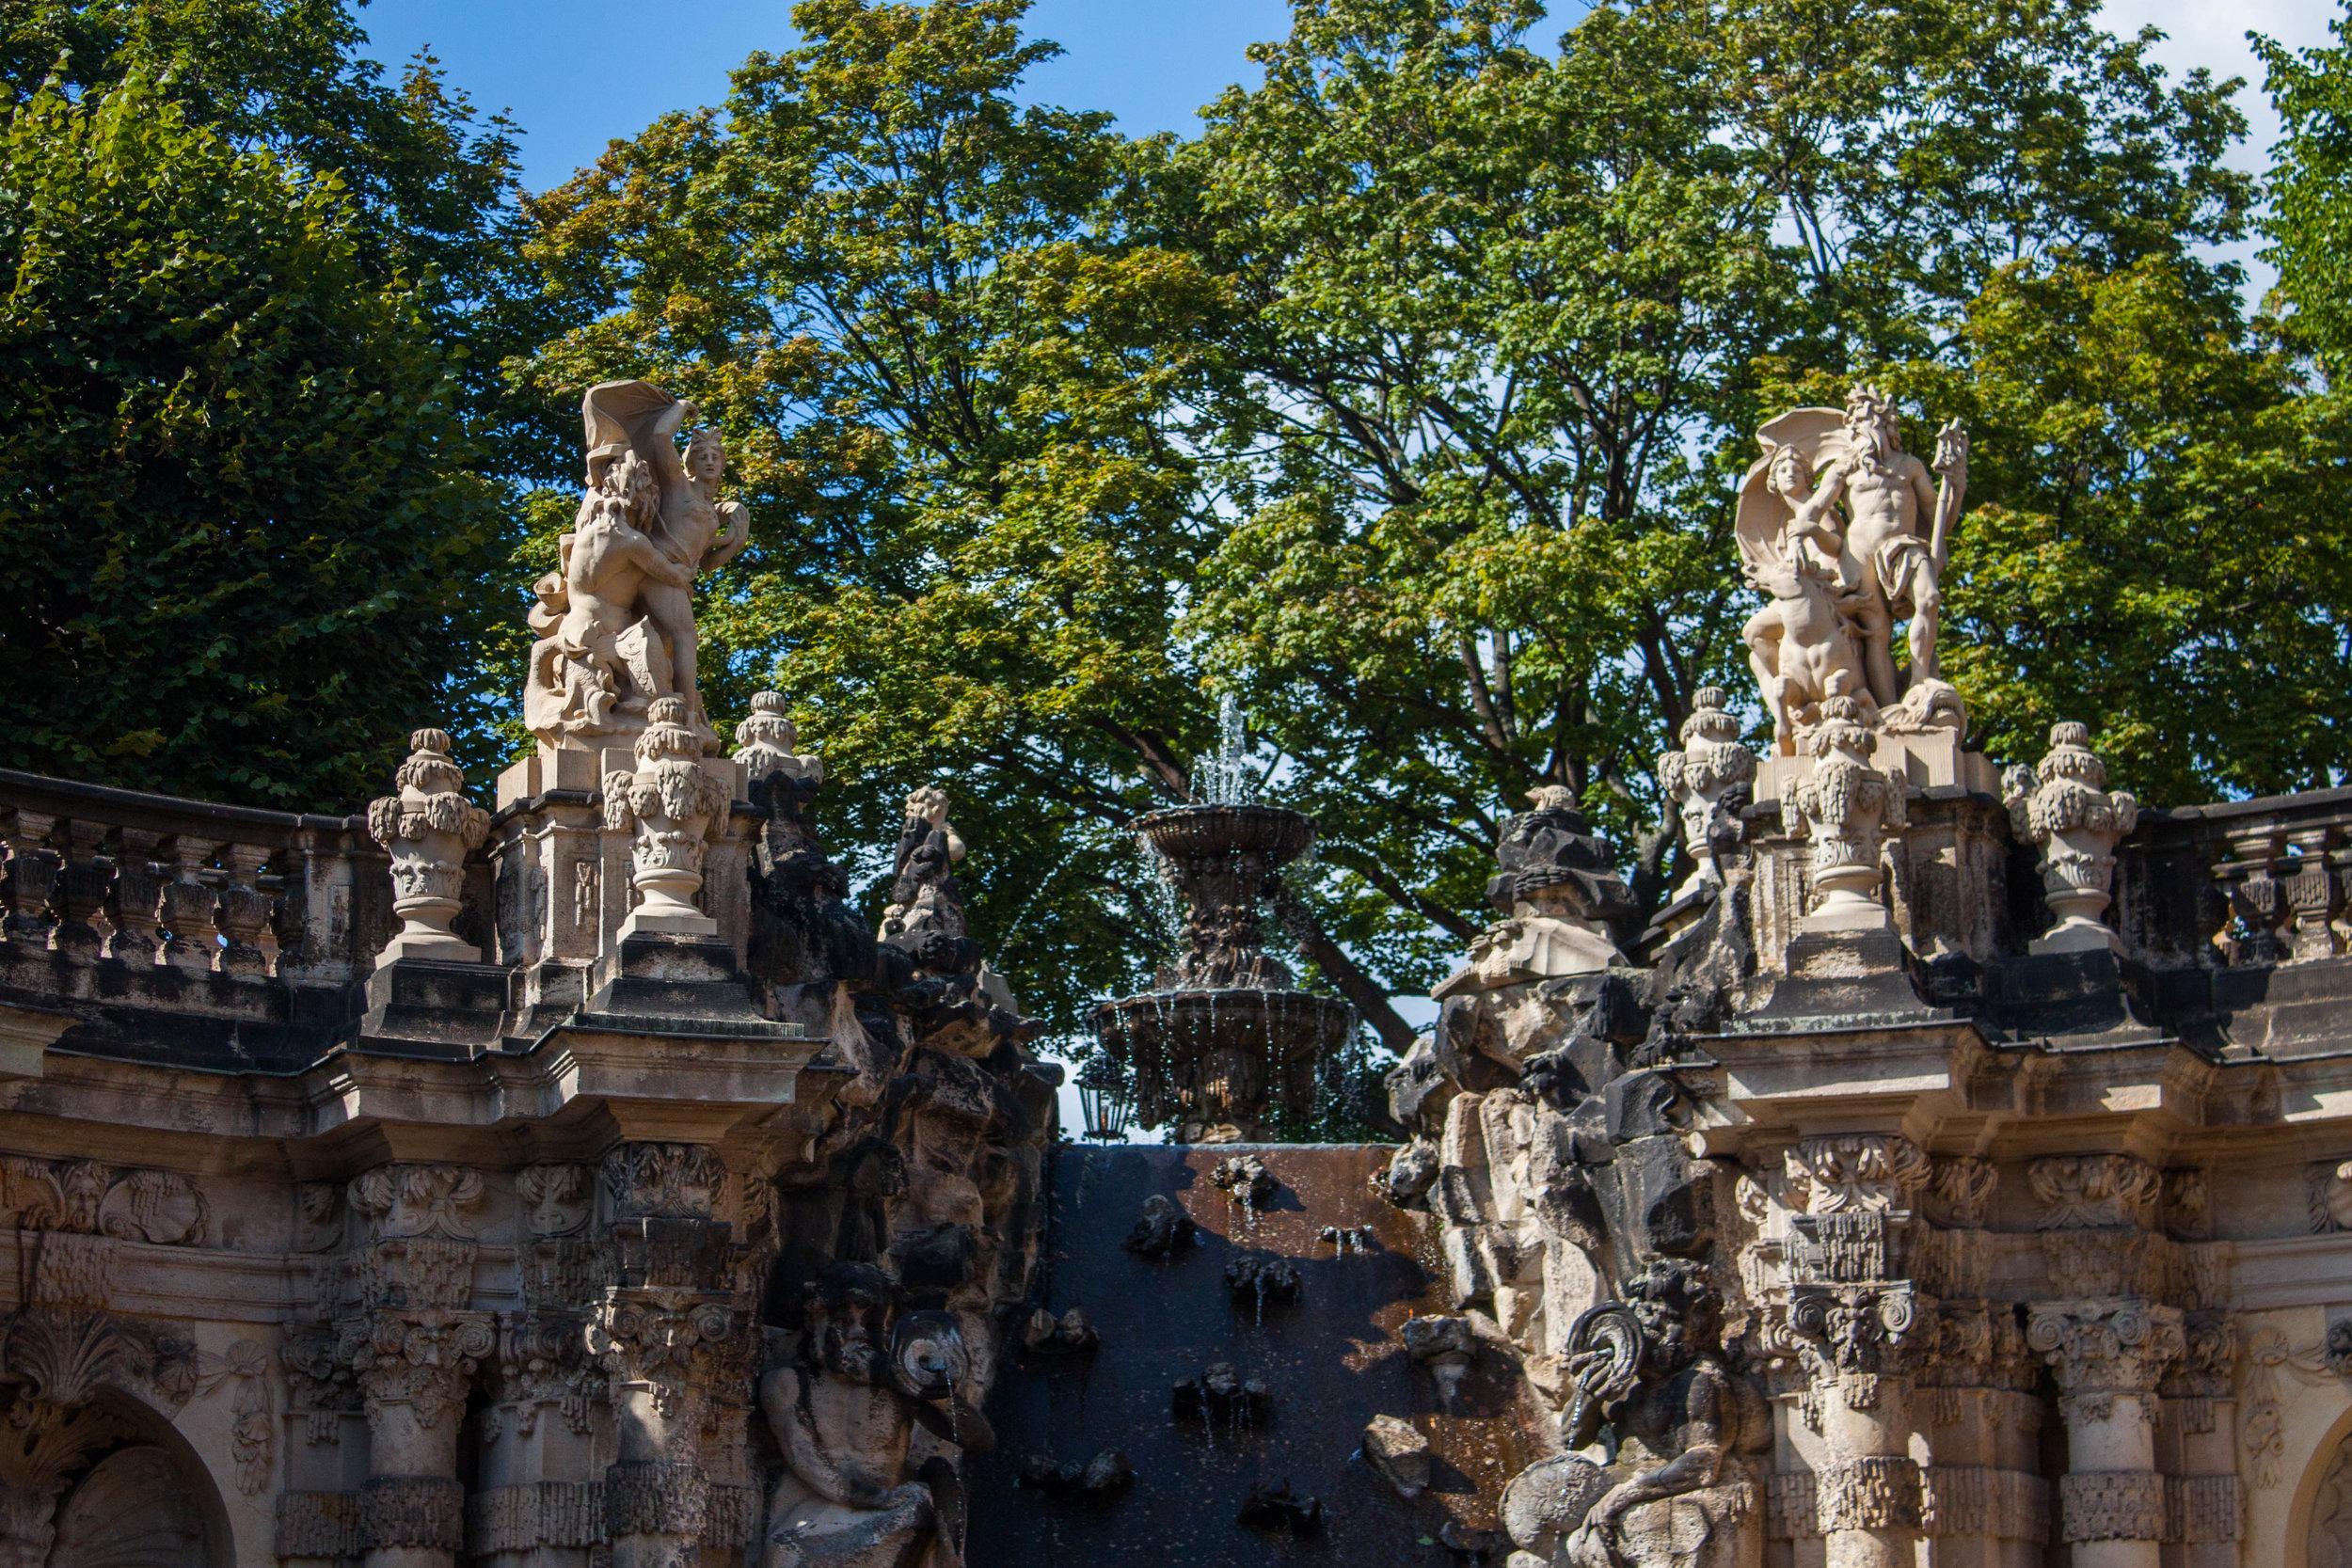 Tour of Dresden's Zwinger